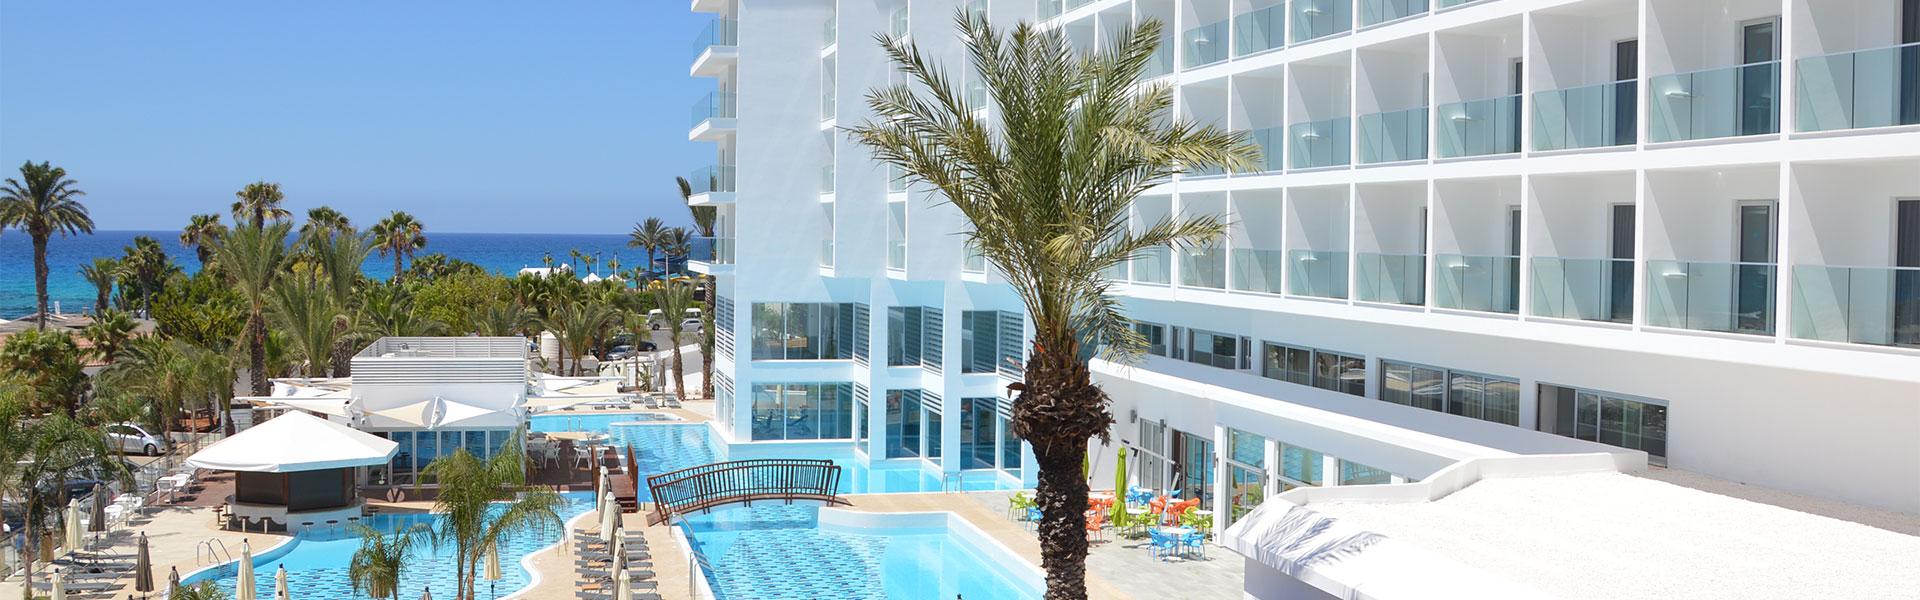 Vassos Nissi Plage Hotel 4-Ayia Napa-Jumbo Travel-hotel overview